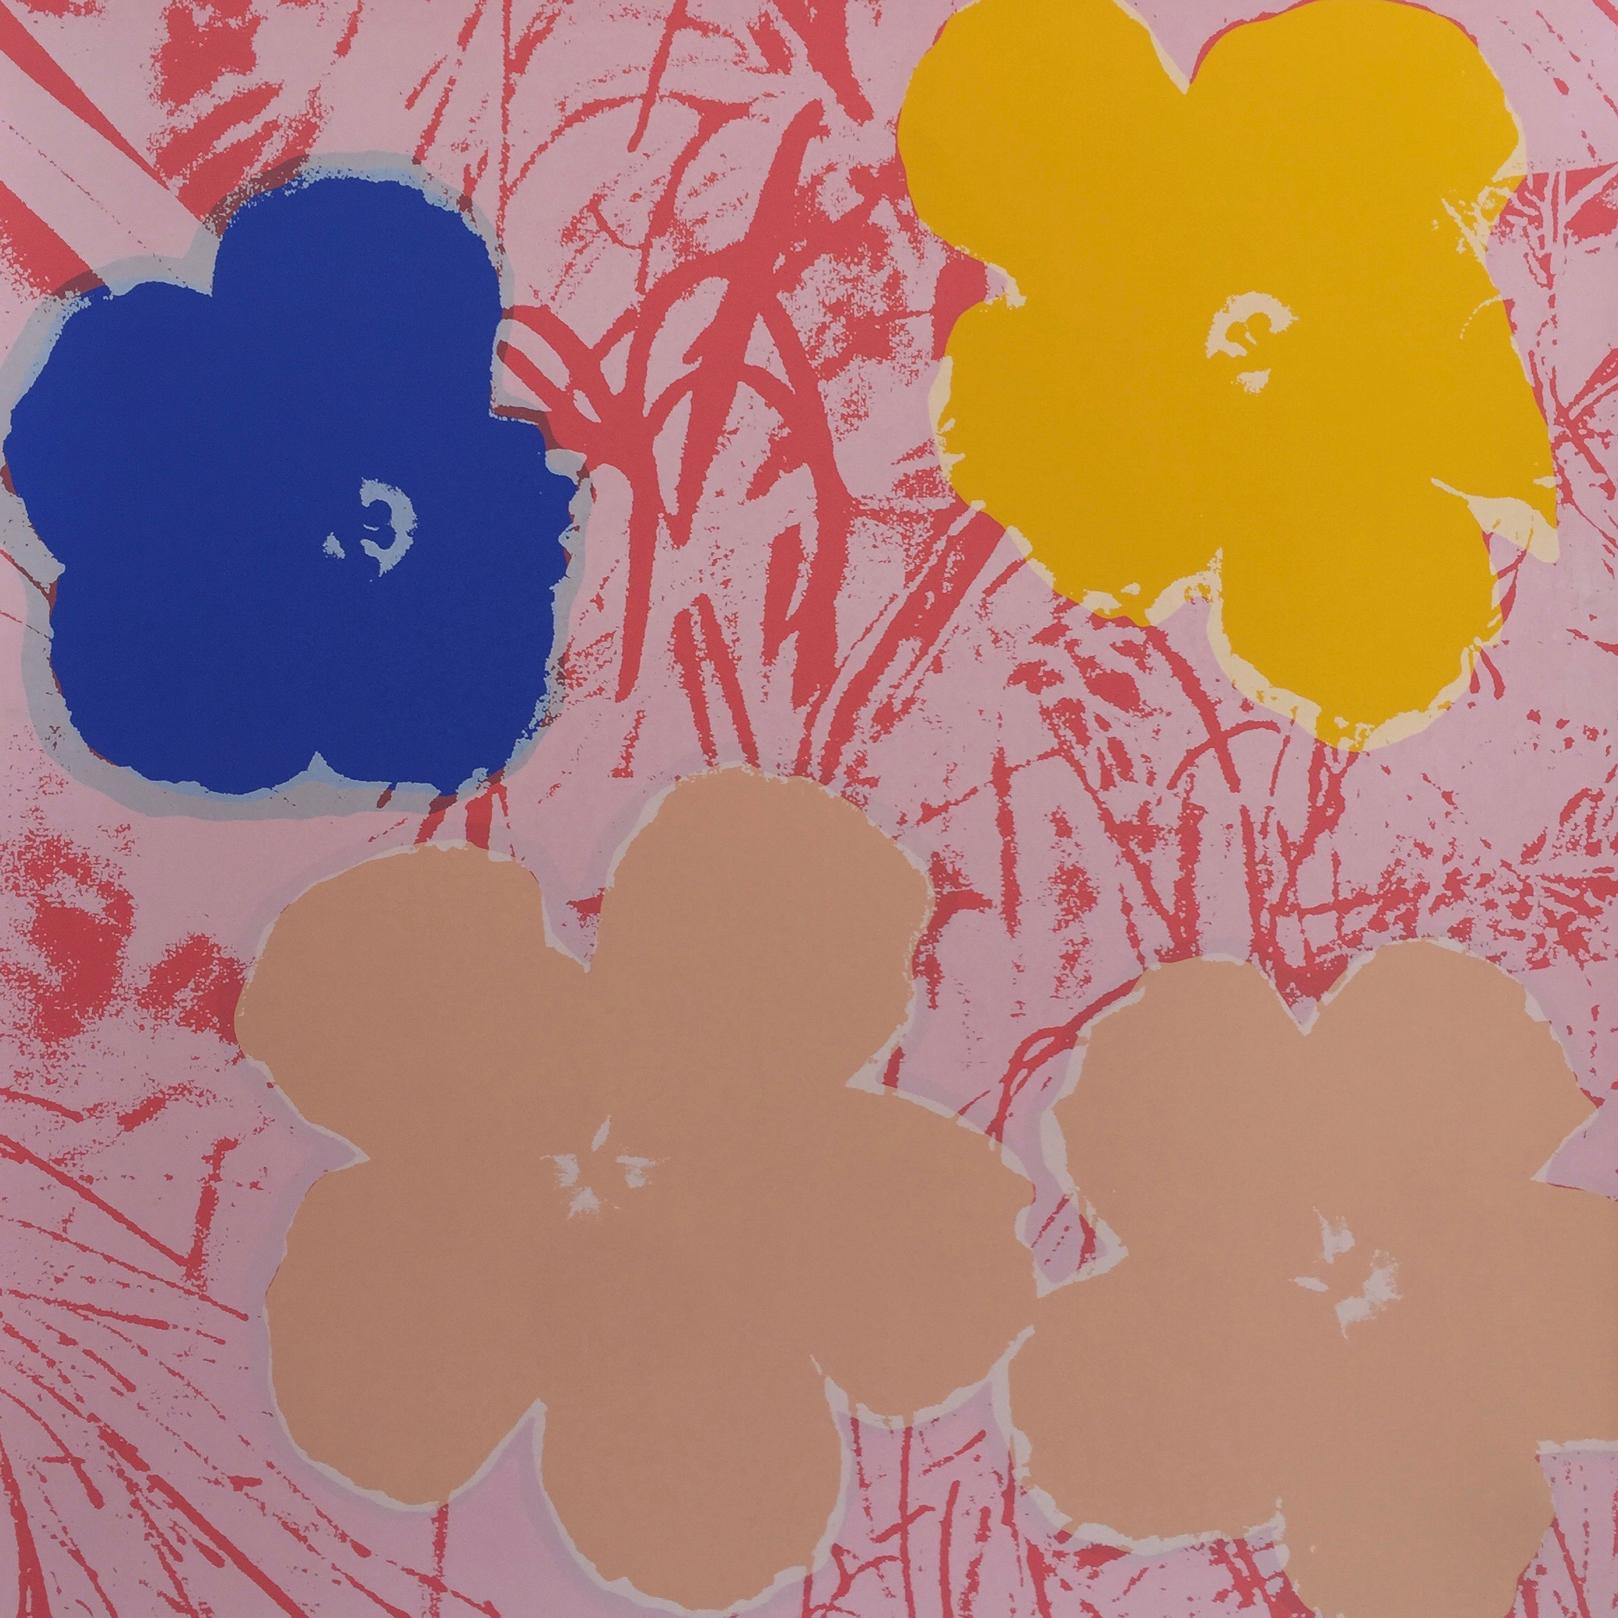 11.70: Flowers